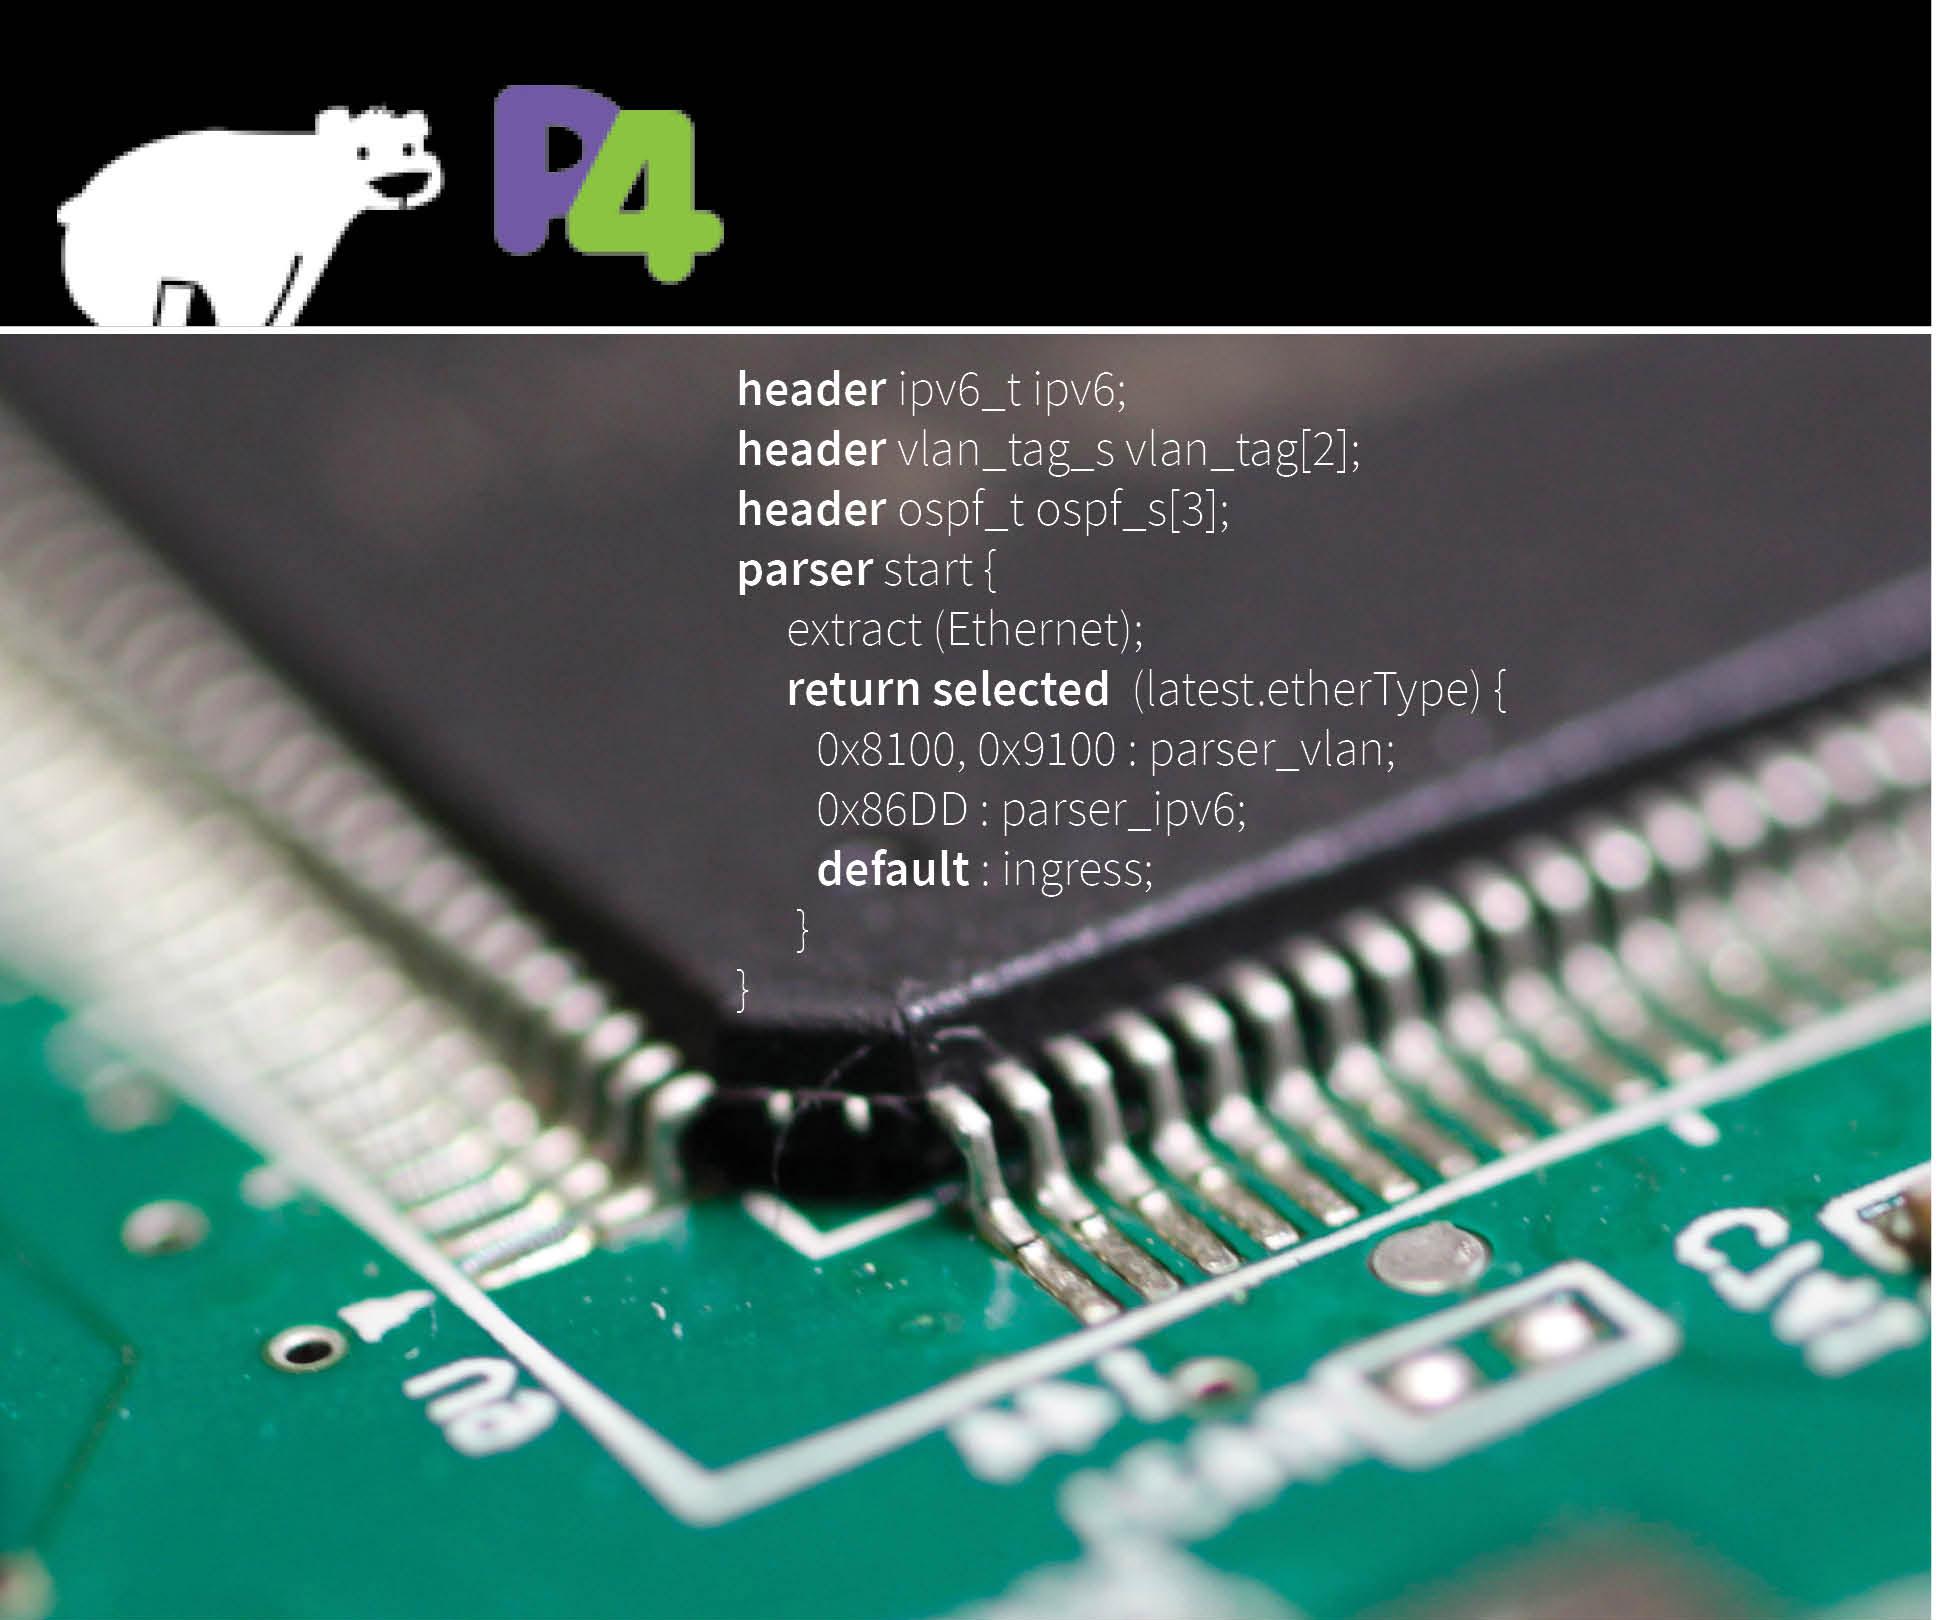 sdn2.0 P4: Software parser